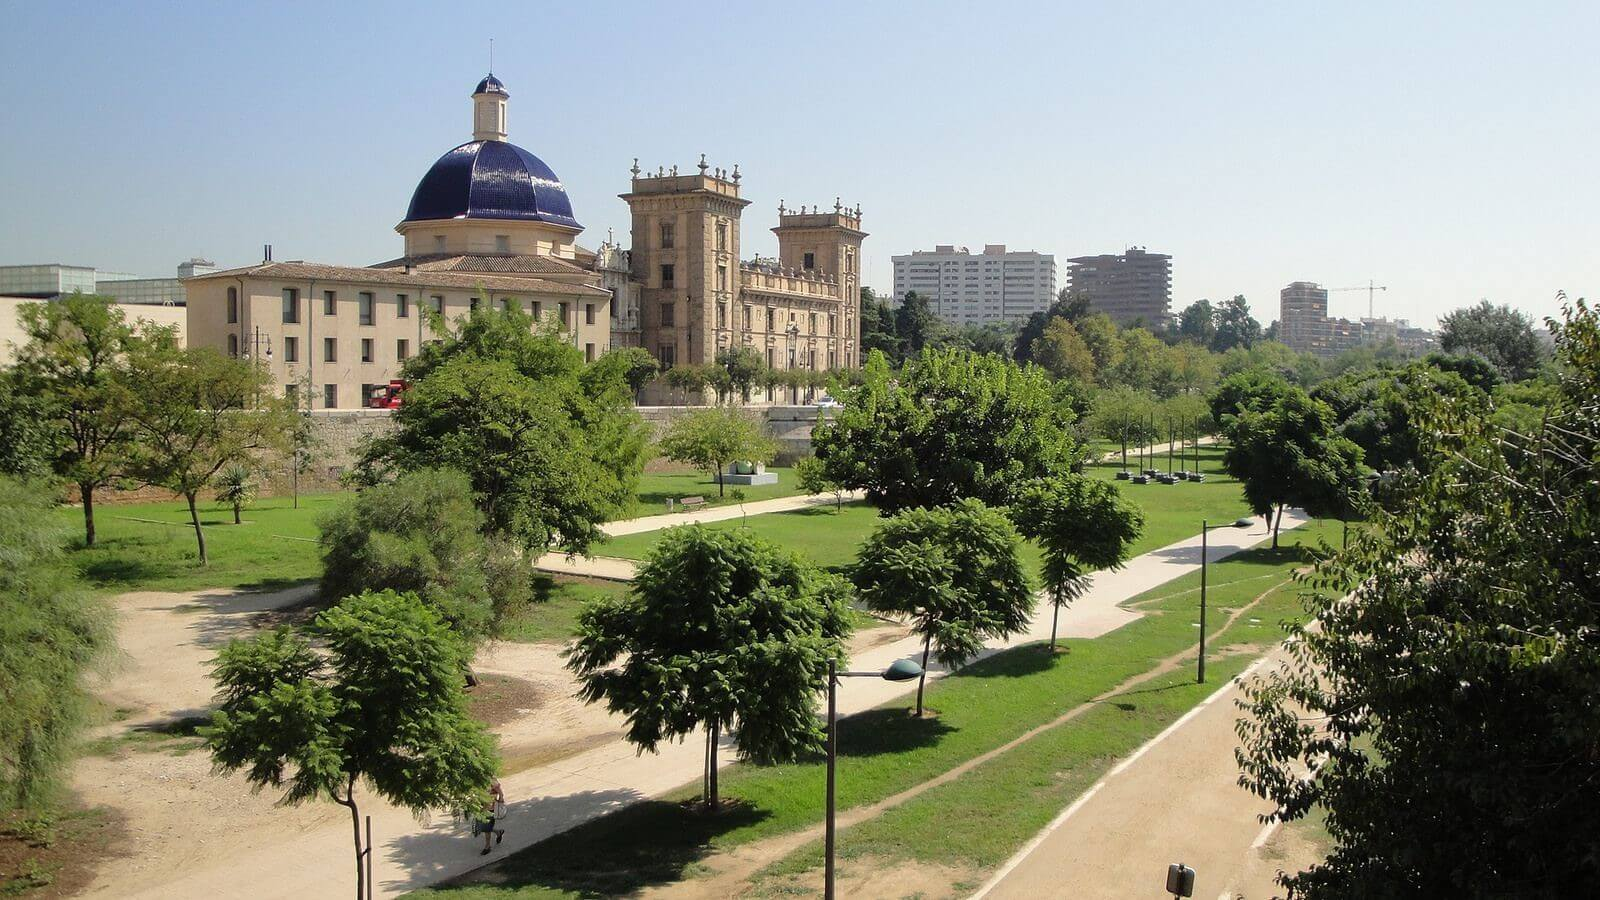 Gradinile Turia - Valencia